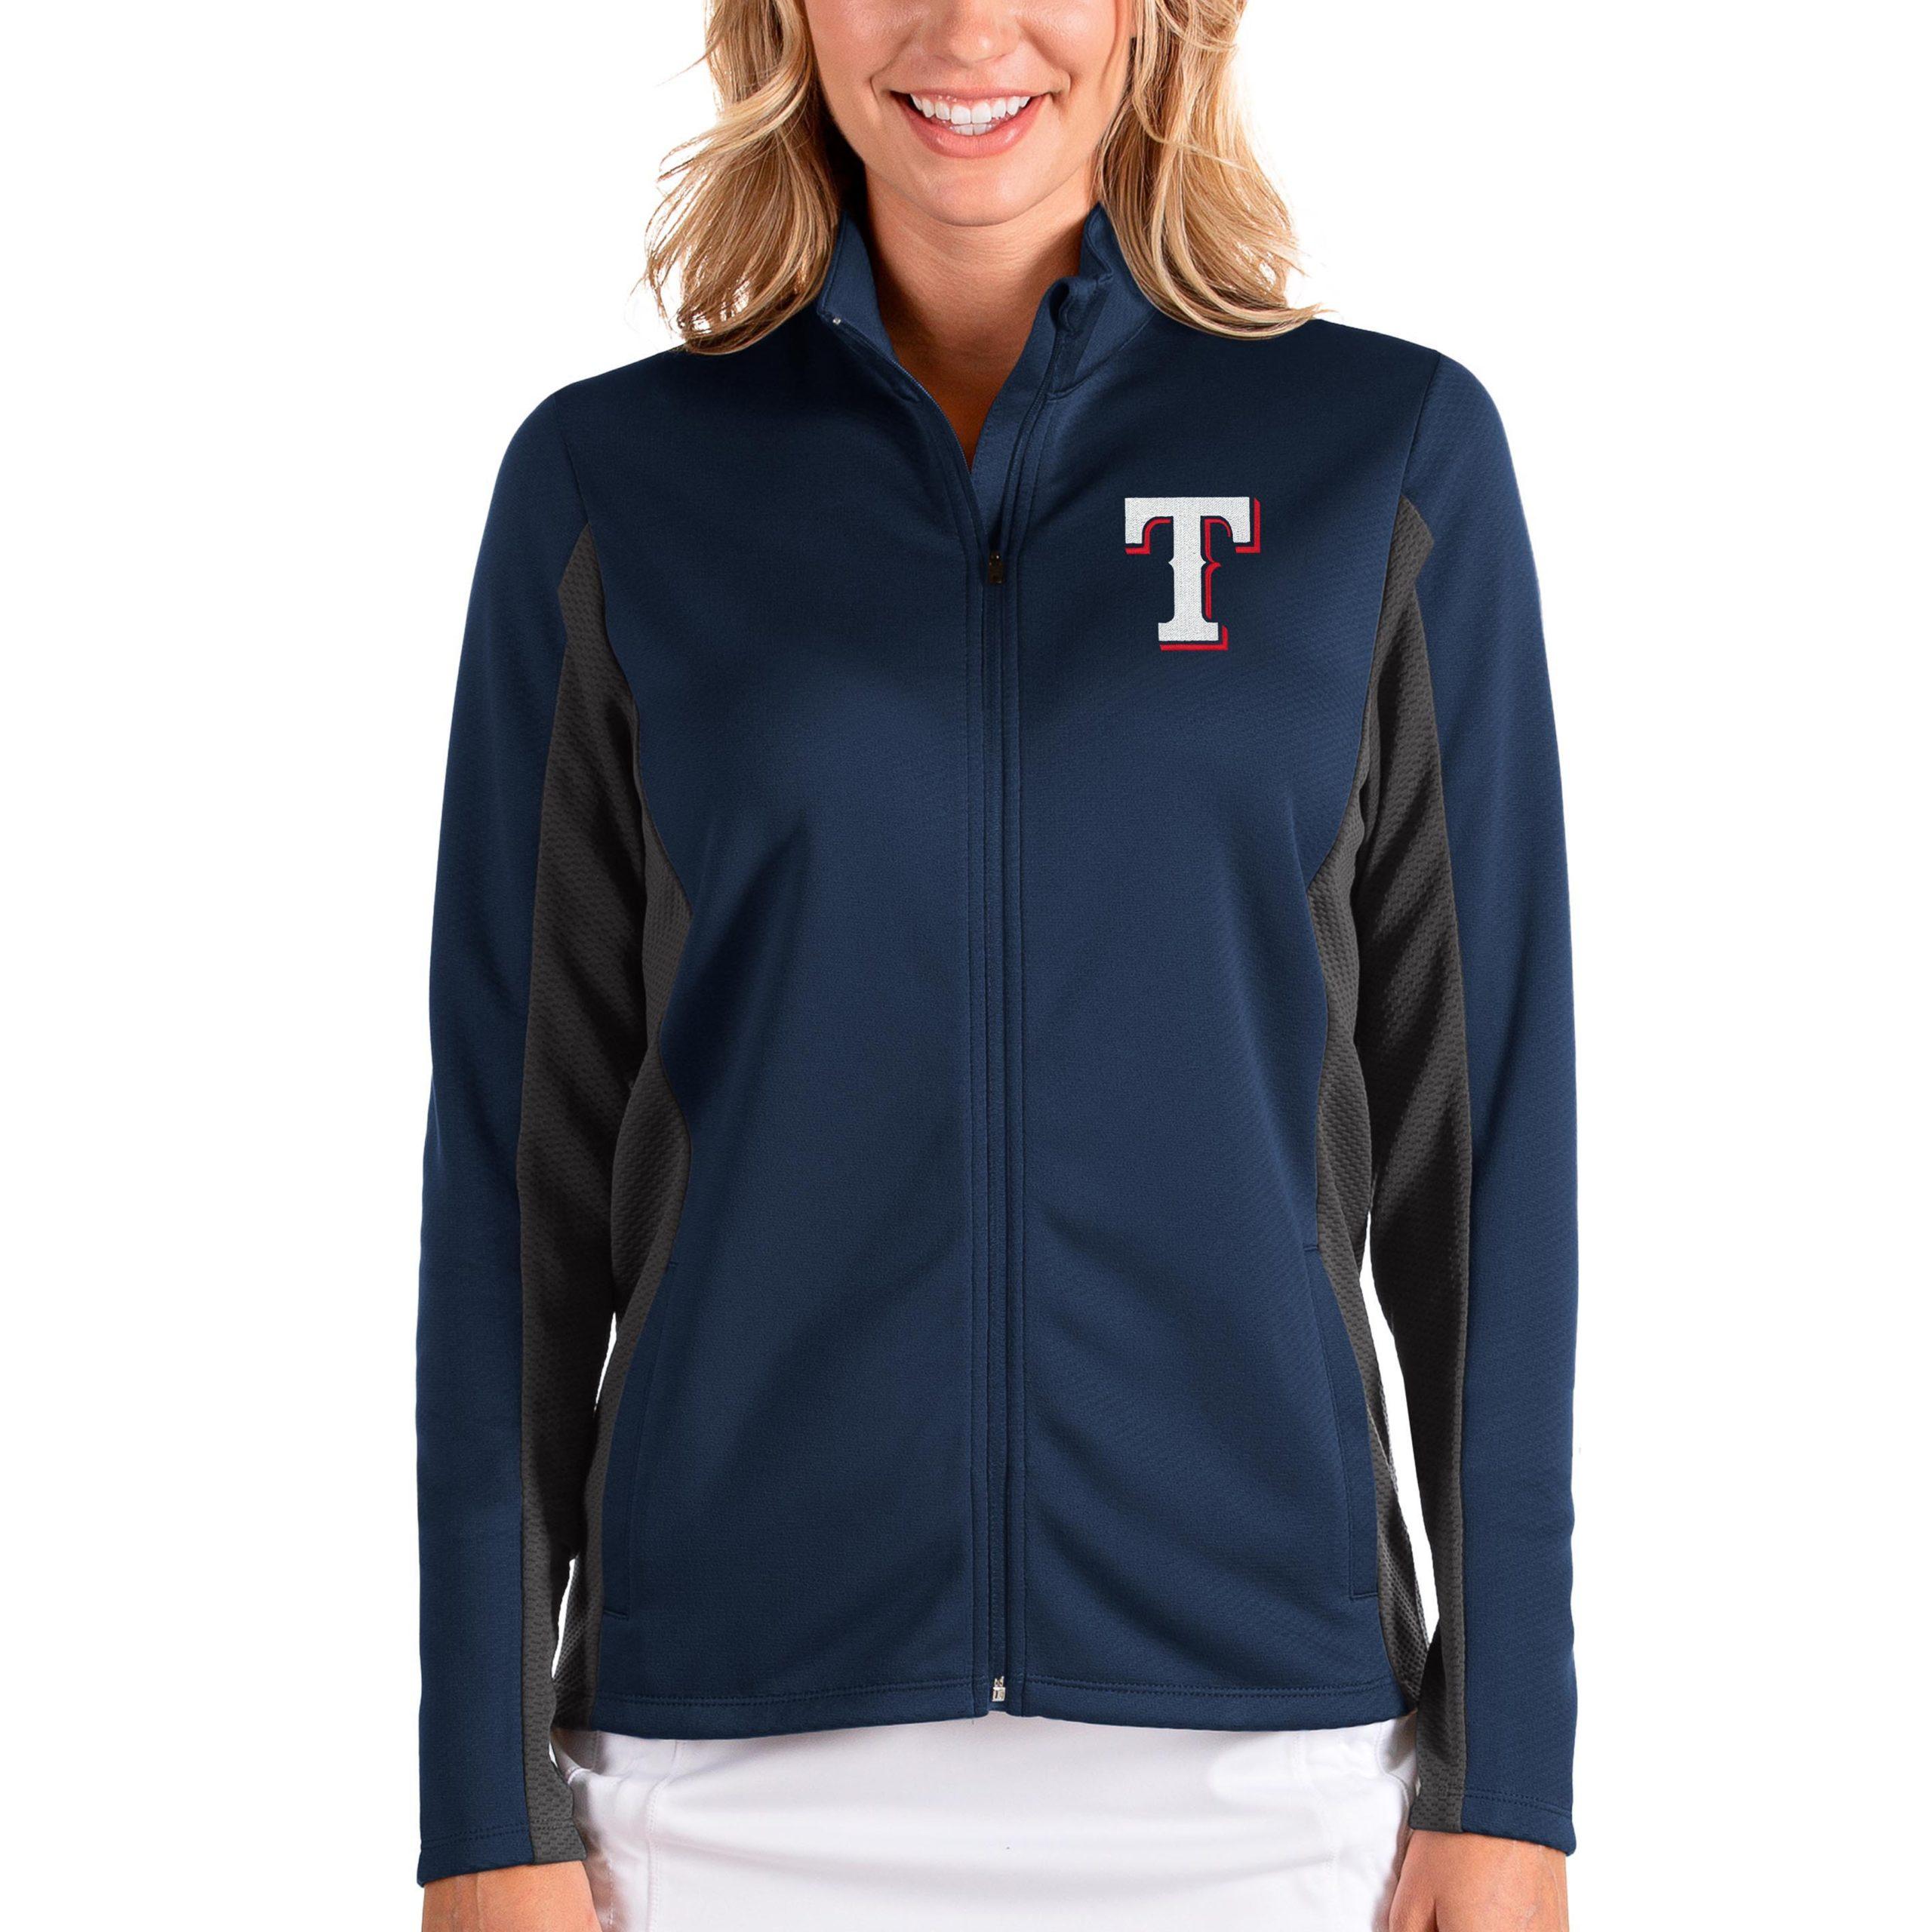 Texas Rangers Antigua Women's Passage Full-Zip Jacket - Navy/Charcoal